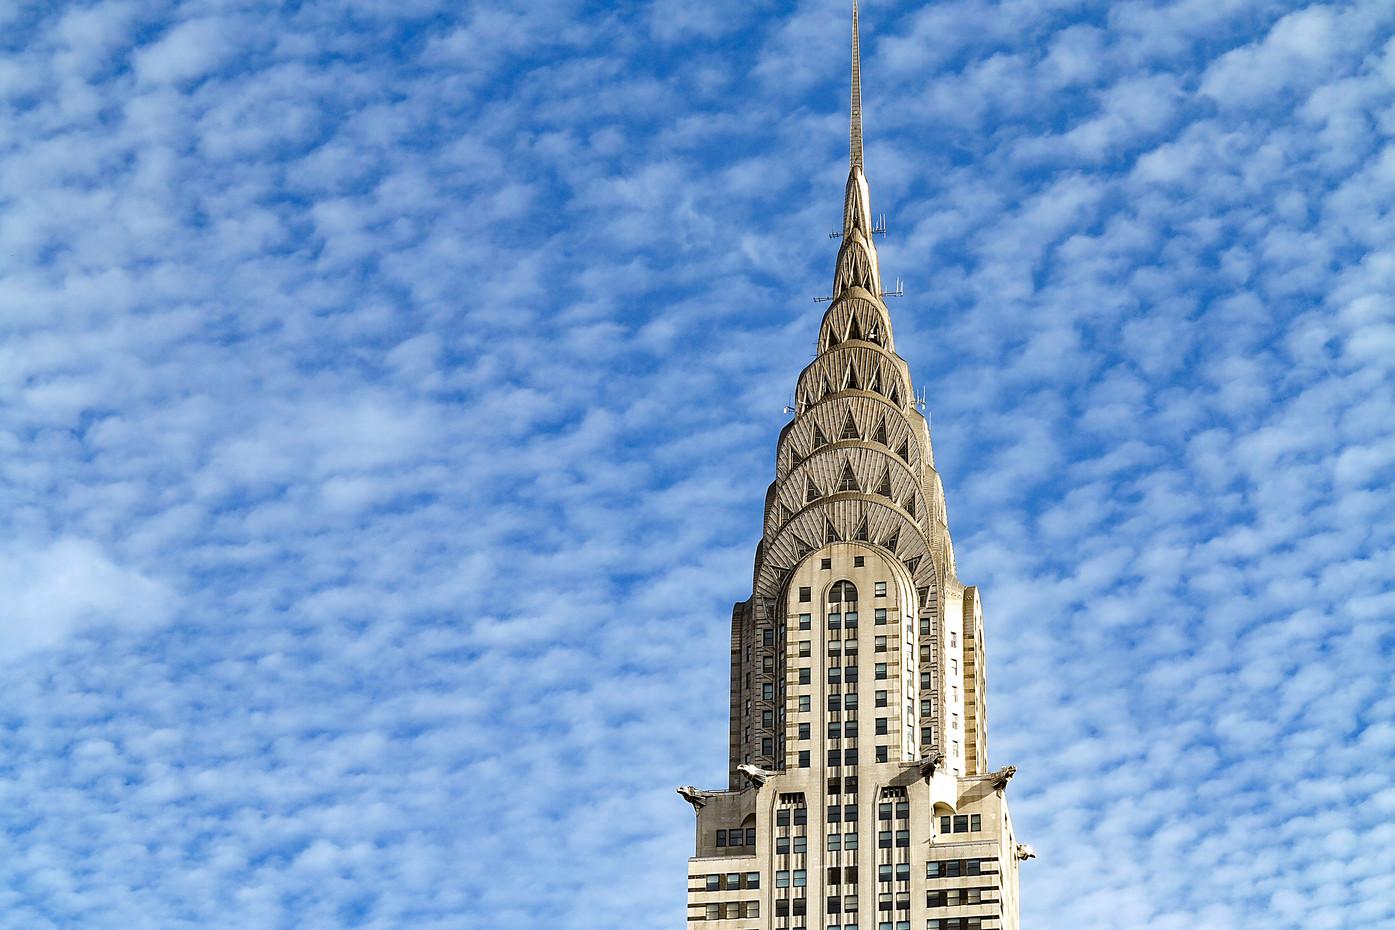 The Chrysler building in Manhattan, USA